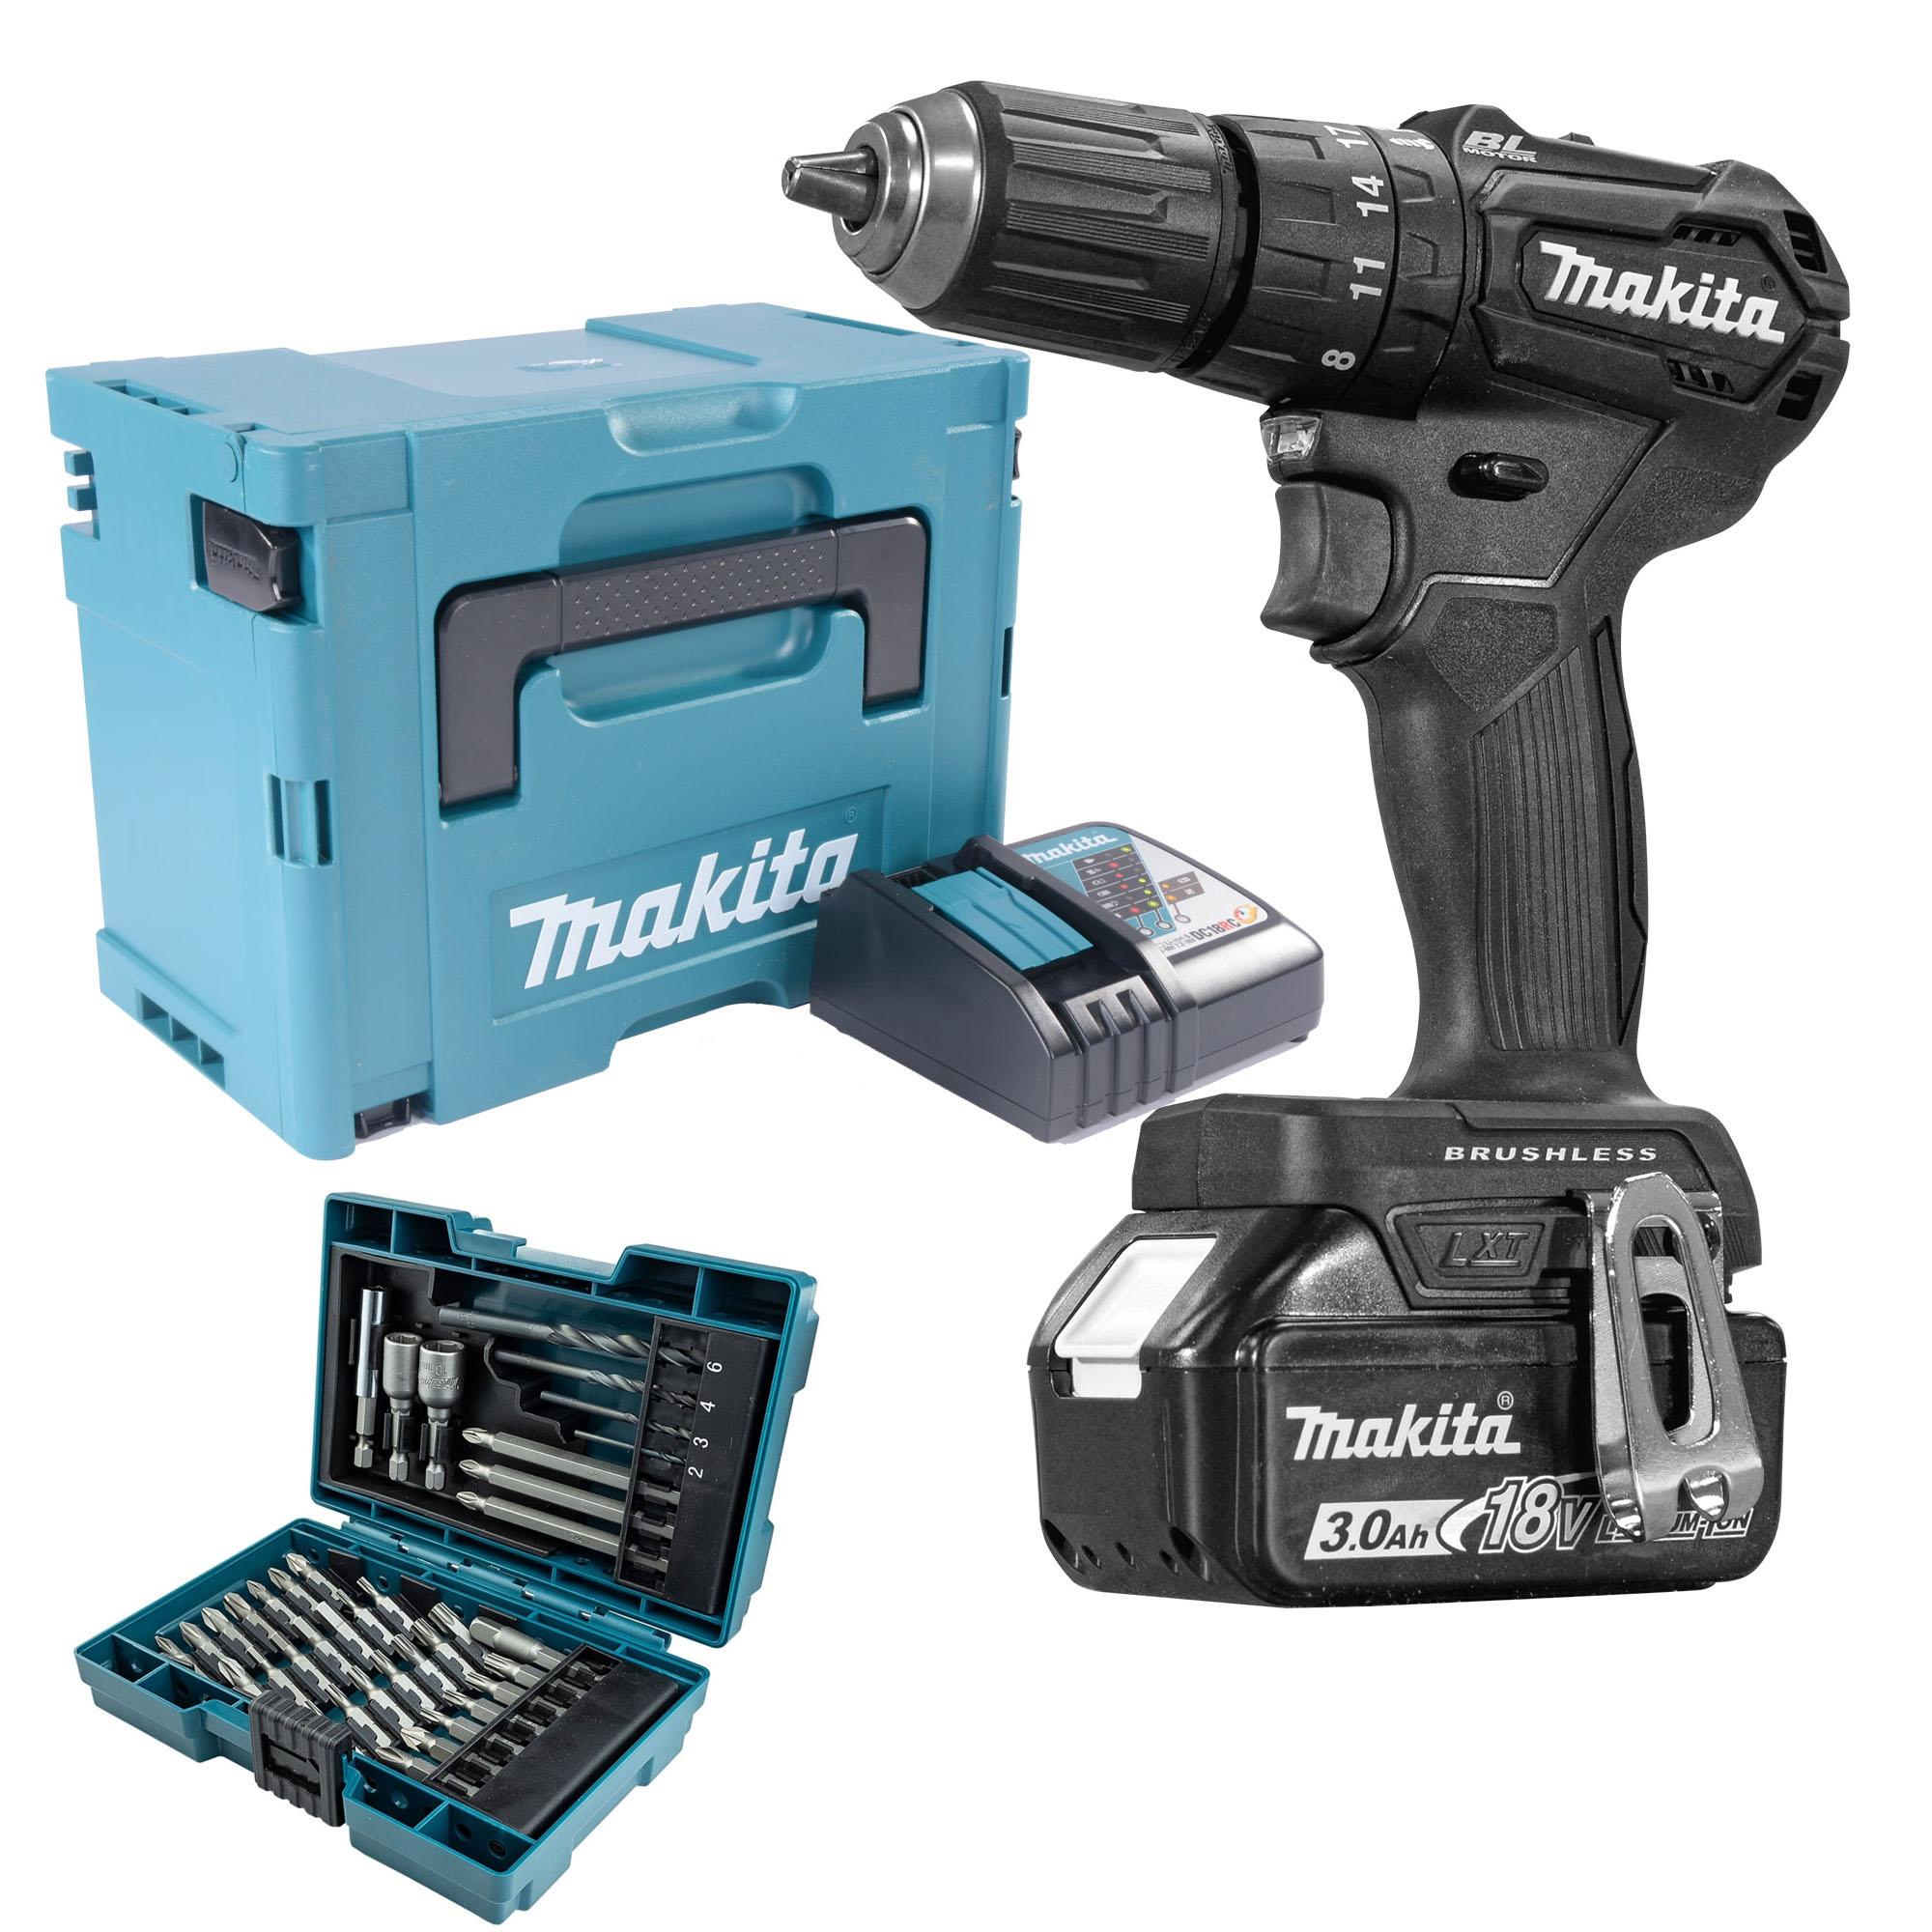 Makita DHP483BRJX 18v Black Brushless Combi Drill with 1 x 3.0Ah Battery £119.99 @ ITS